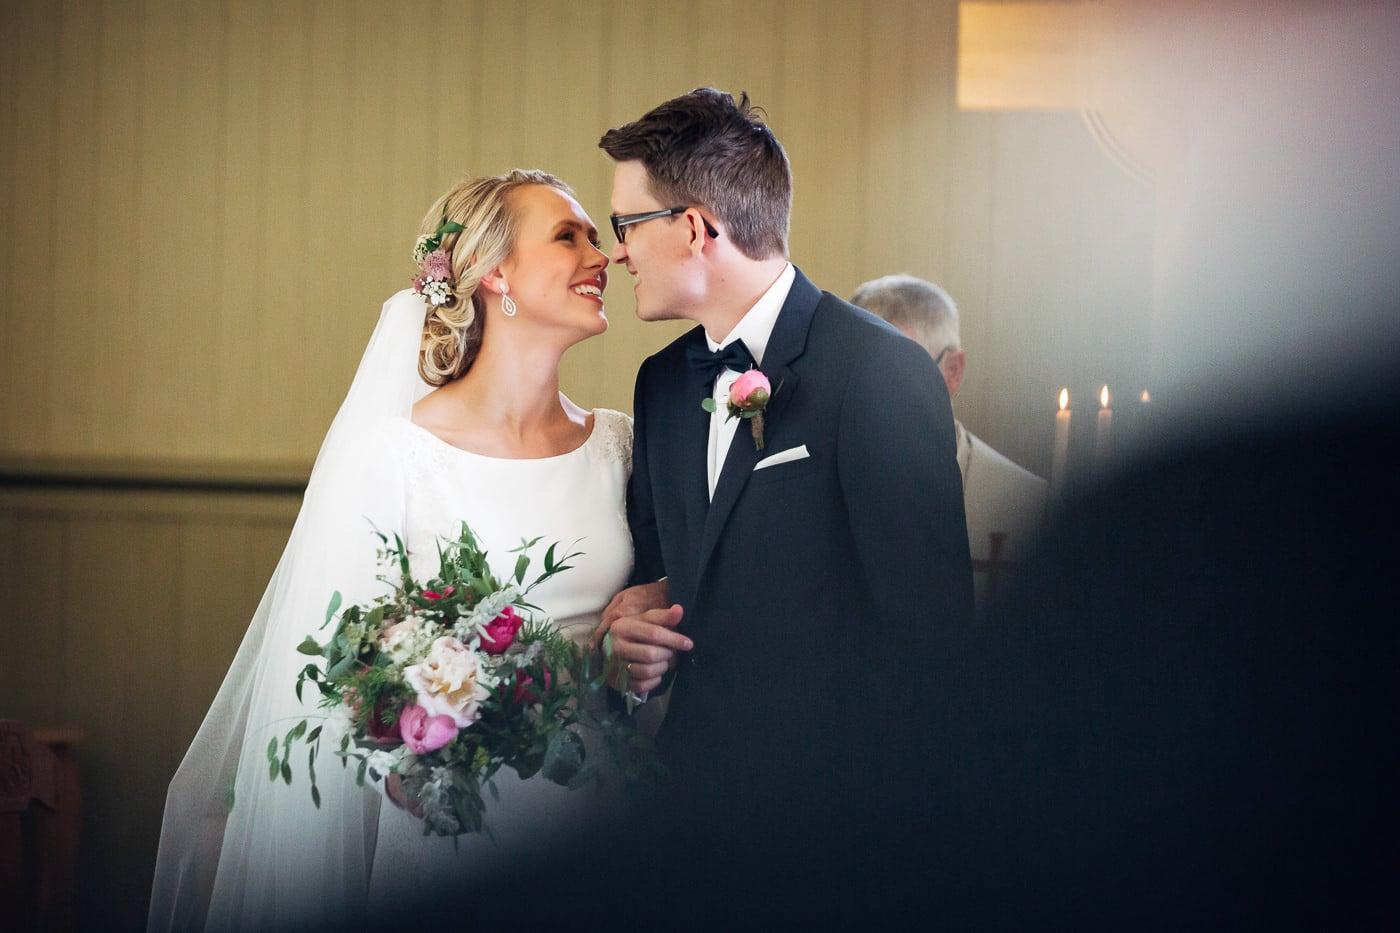 Karoline & Andreas - bryllup i Østfold med magiske detaljer Bryllup Fredrikstad Fotograf 27